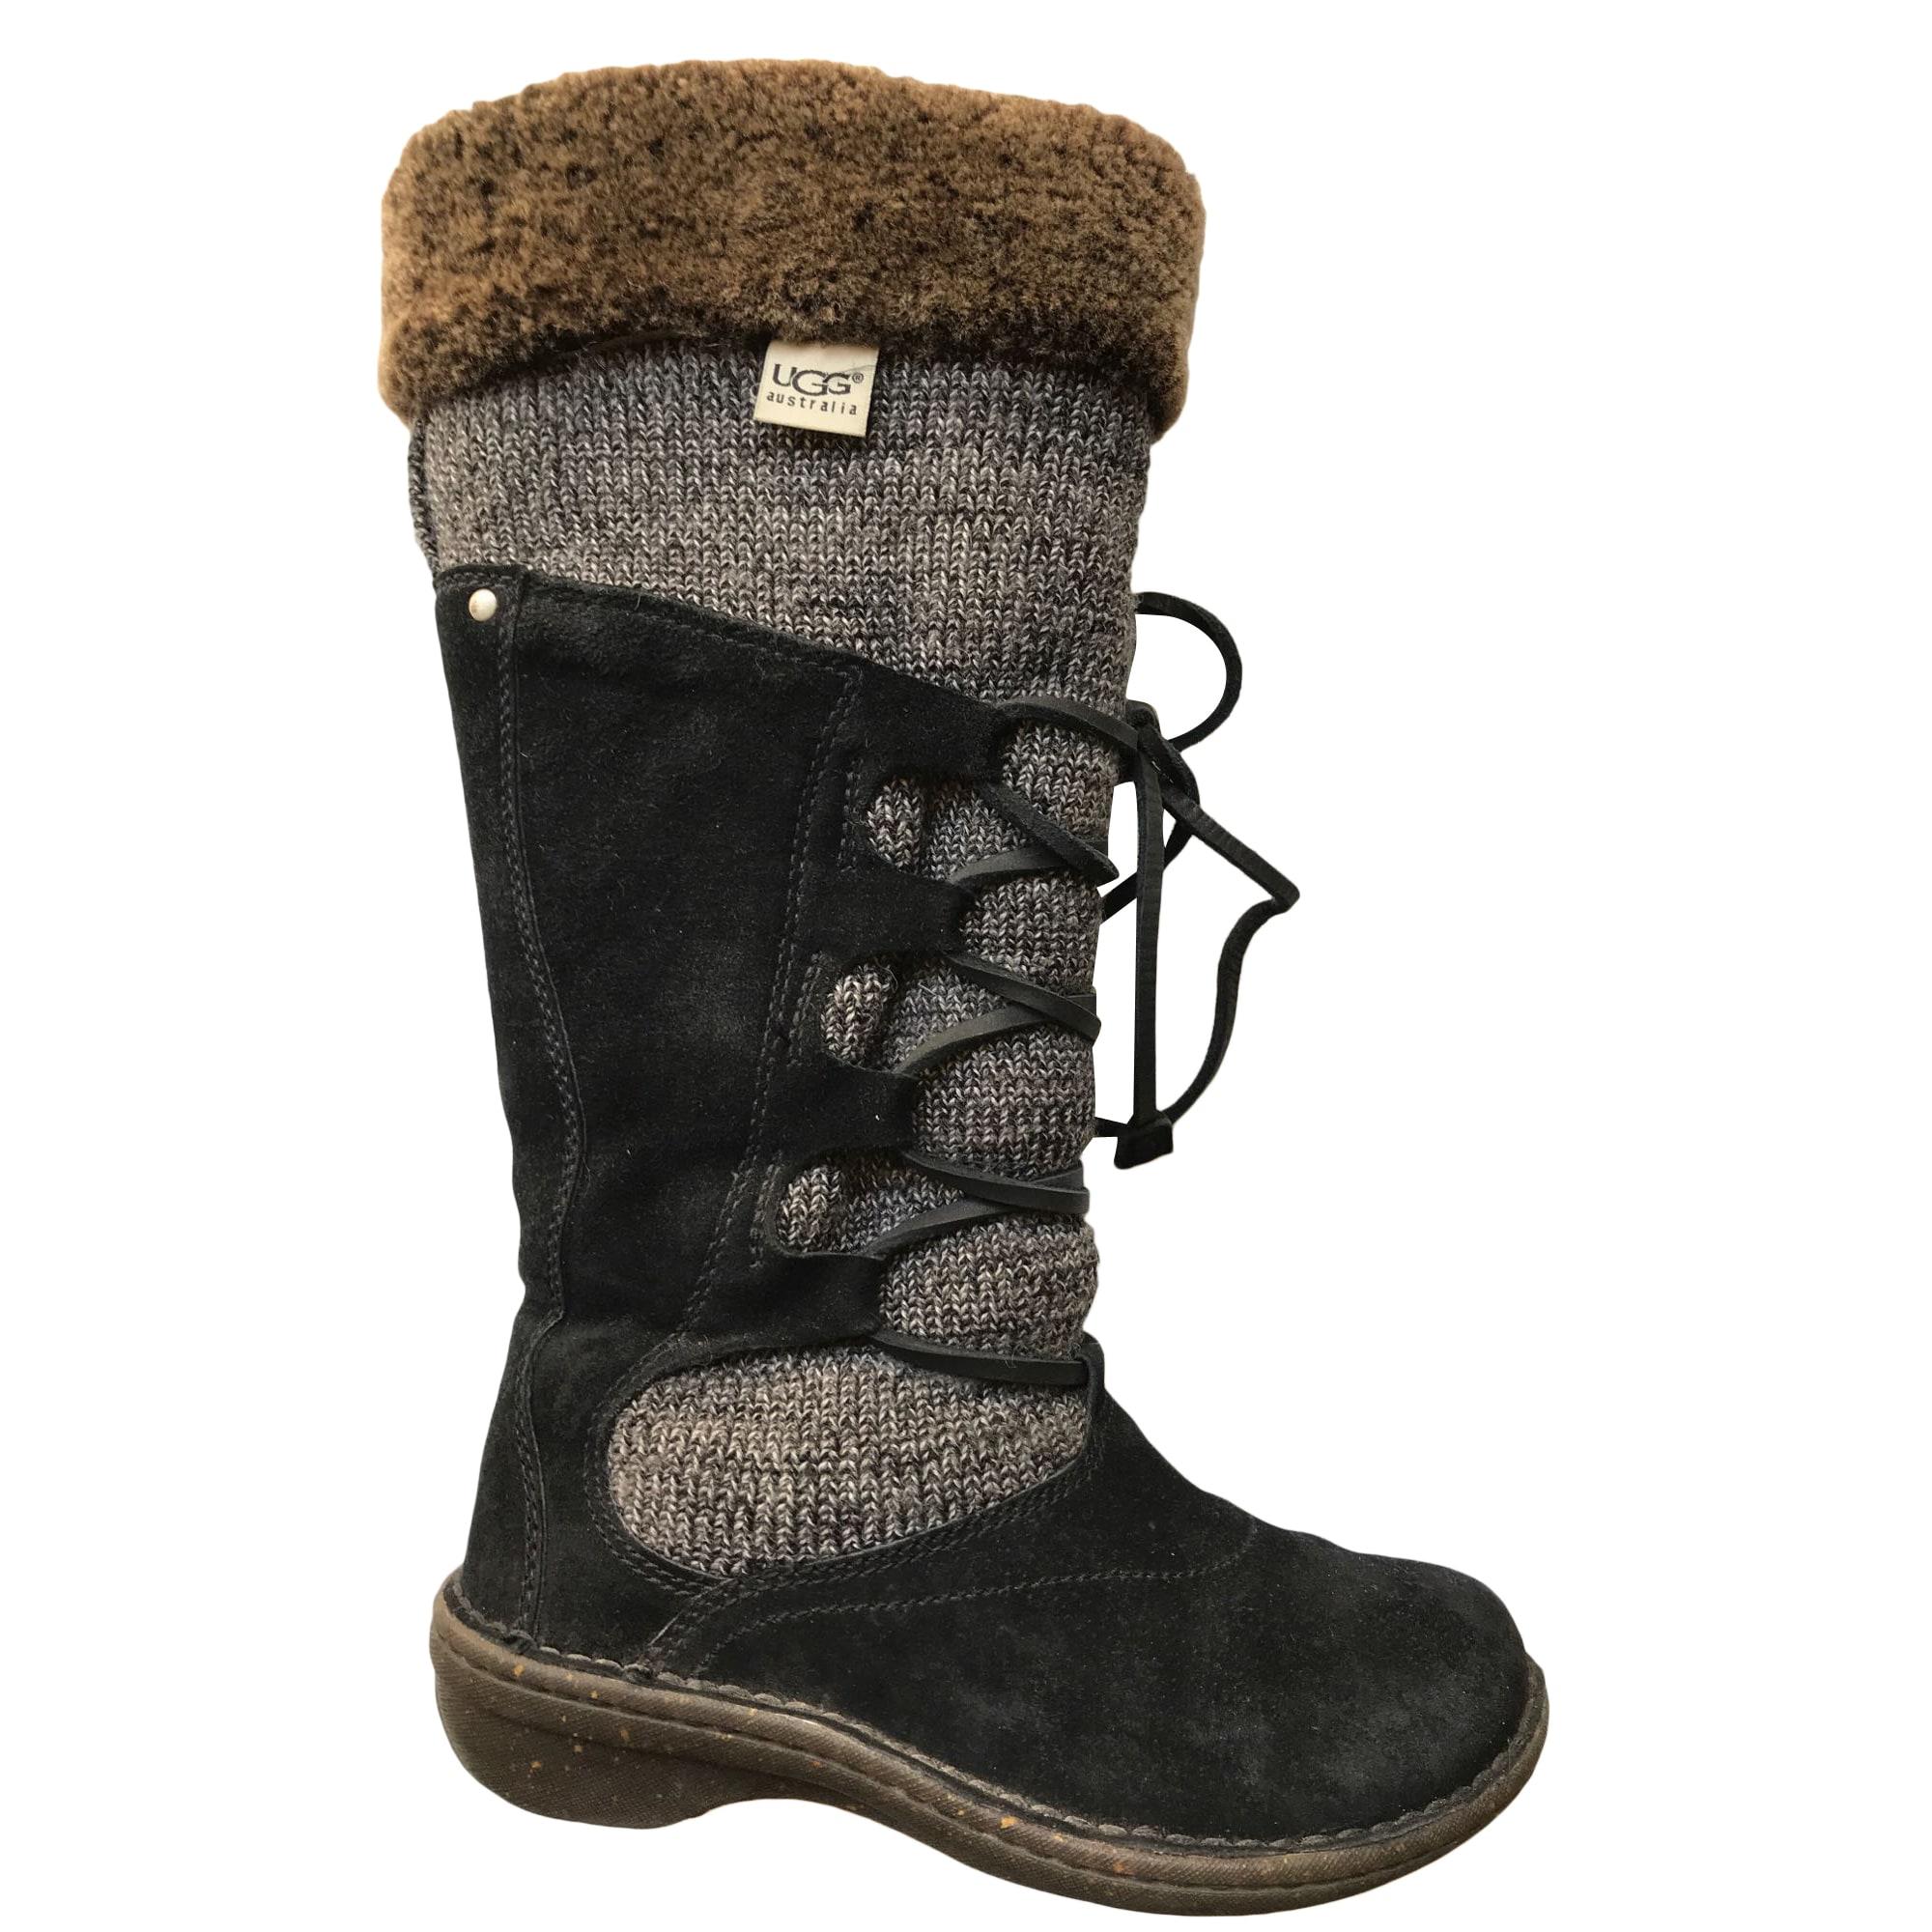 bottes ugg pour neige